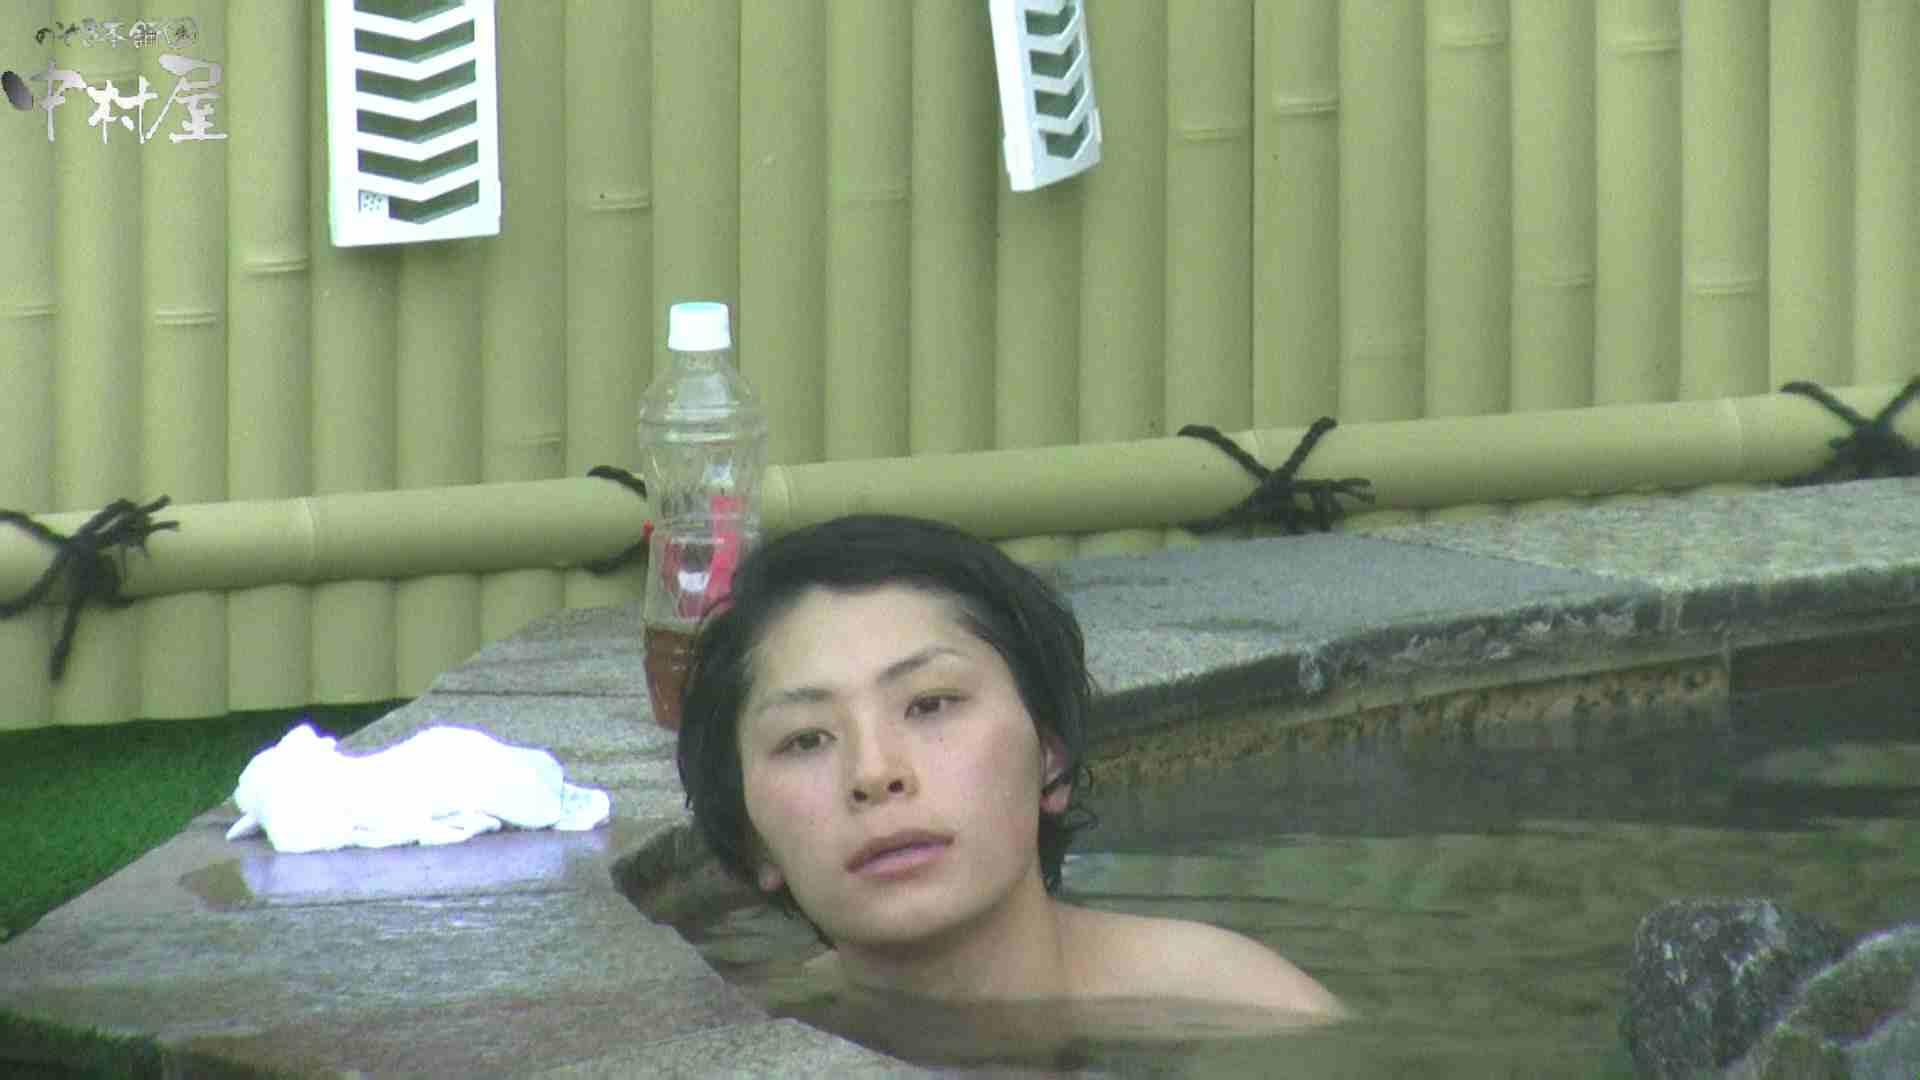 Aquaな露天風呂Vol.970 露天 | OLセックス  97画像 25